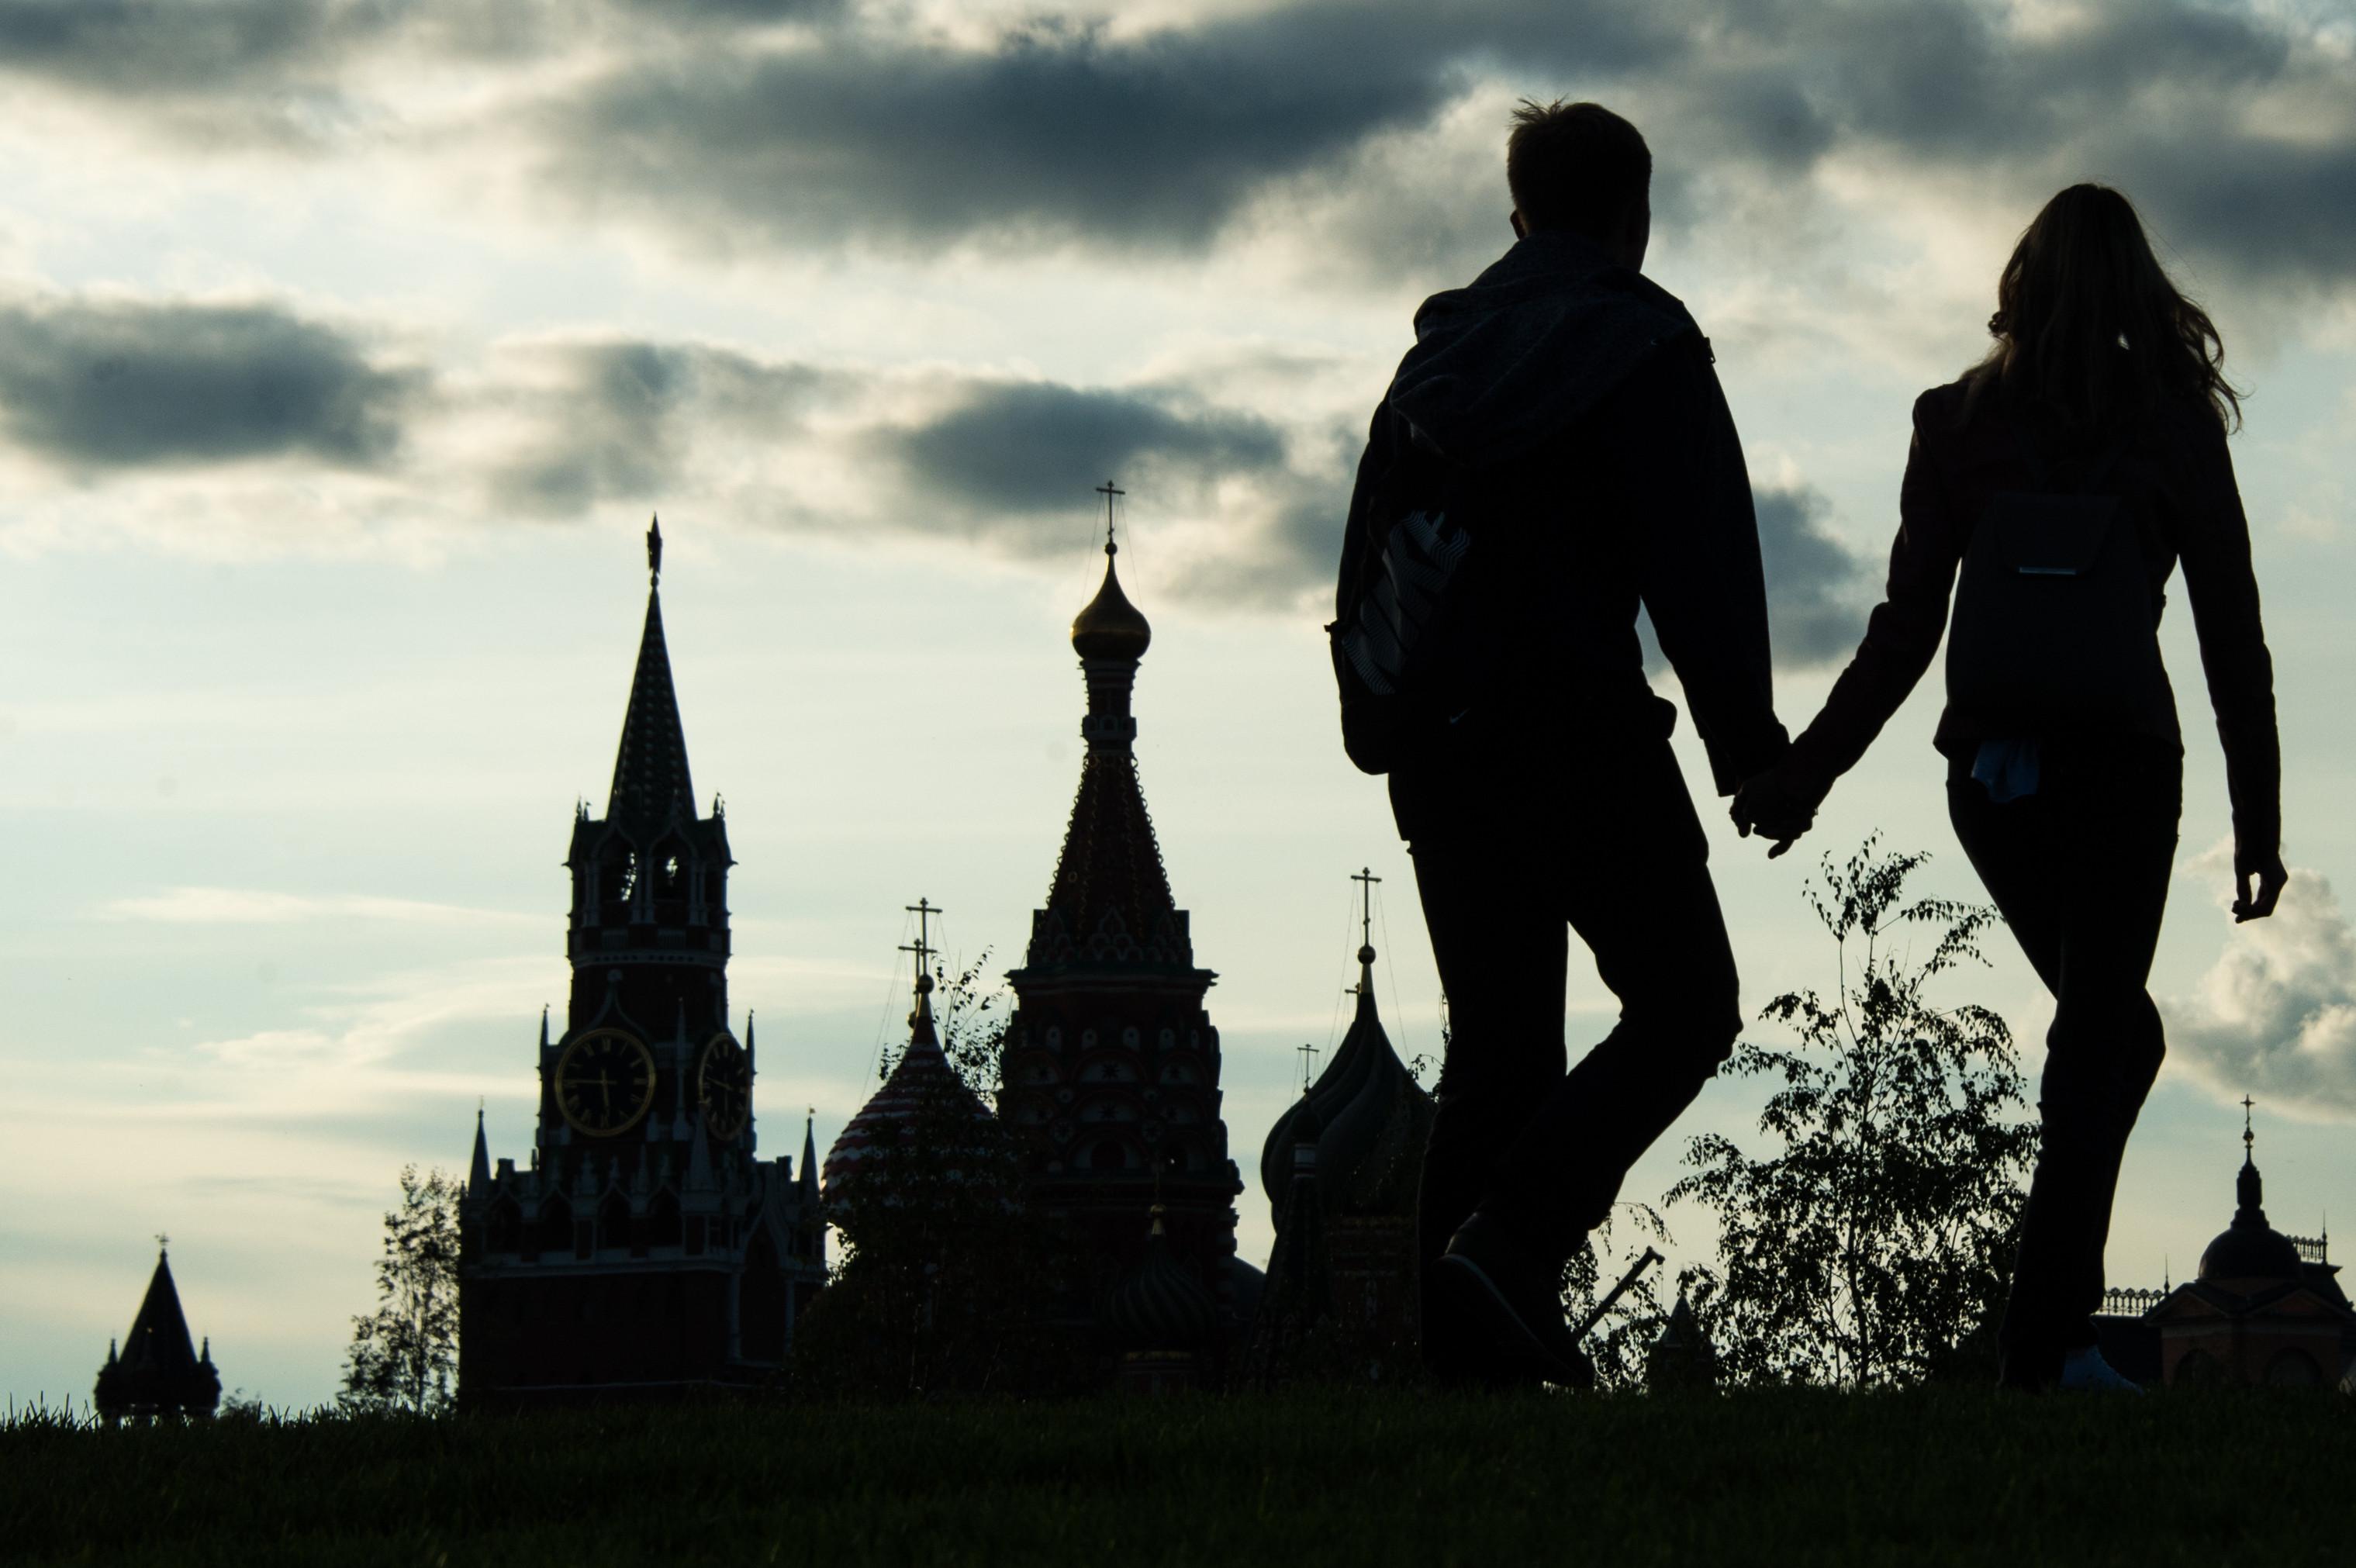 <p>Фото: &copy;РИА Новости/Владимир Сергеев</p>